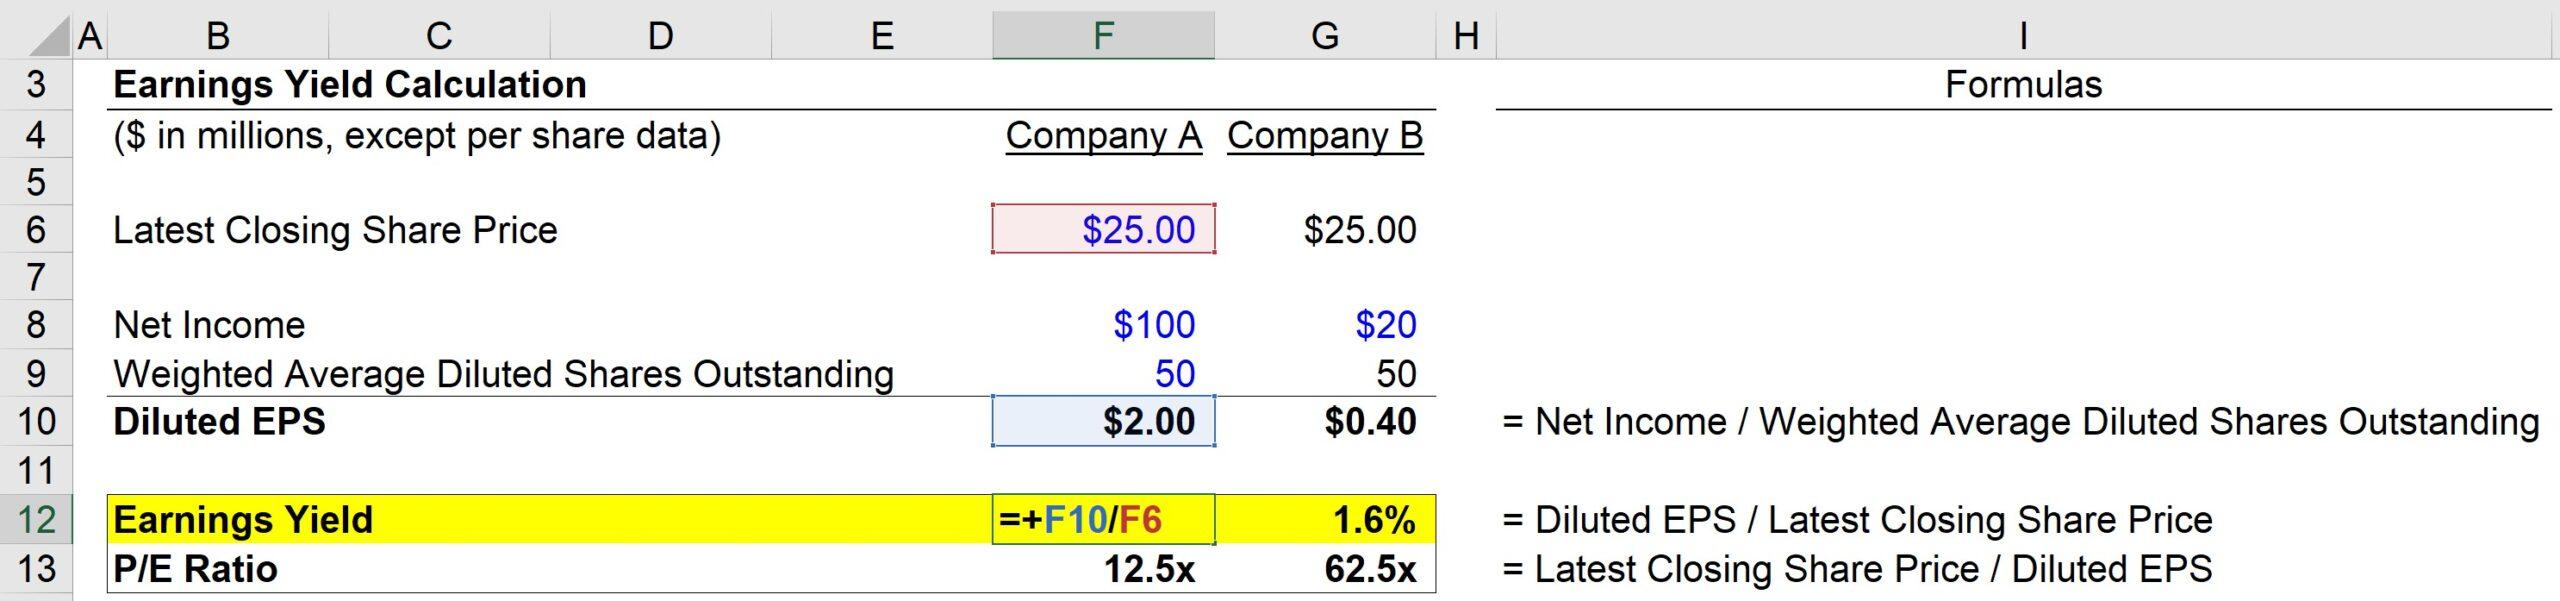 Earnings Yield Formula Excel